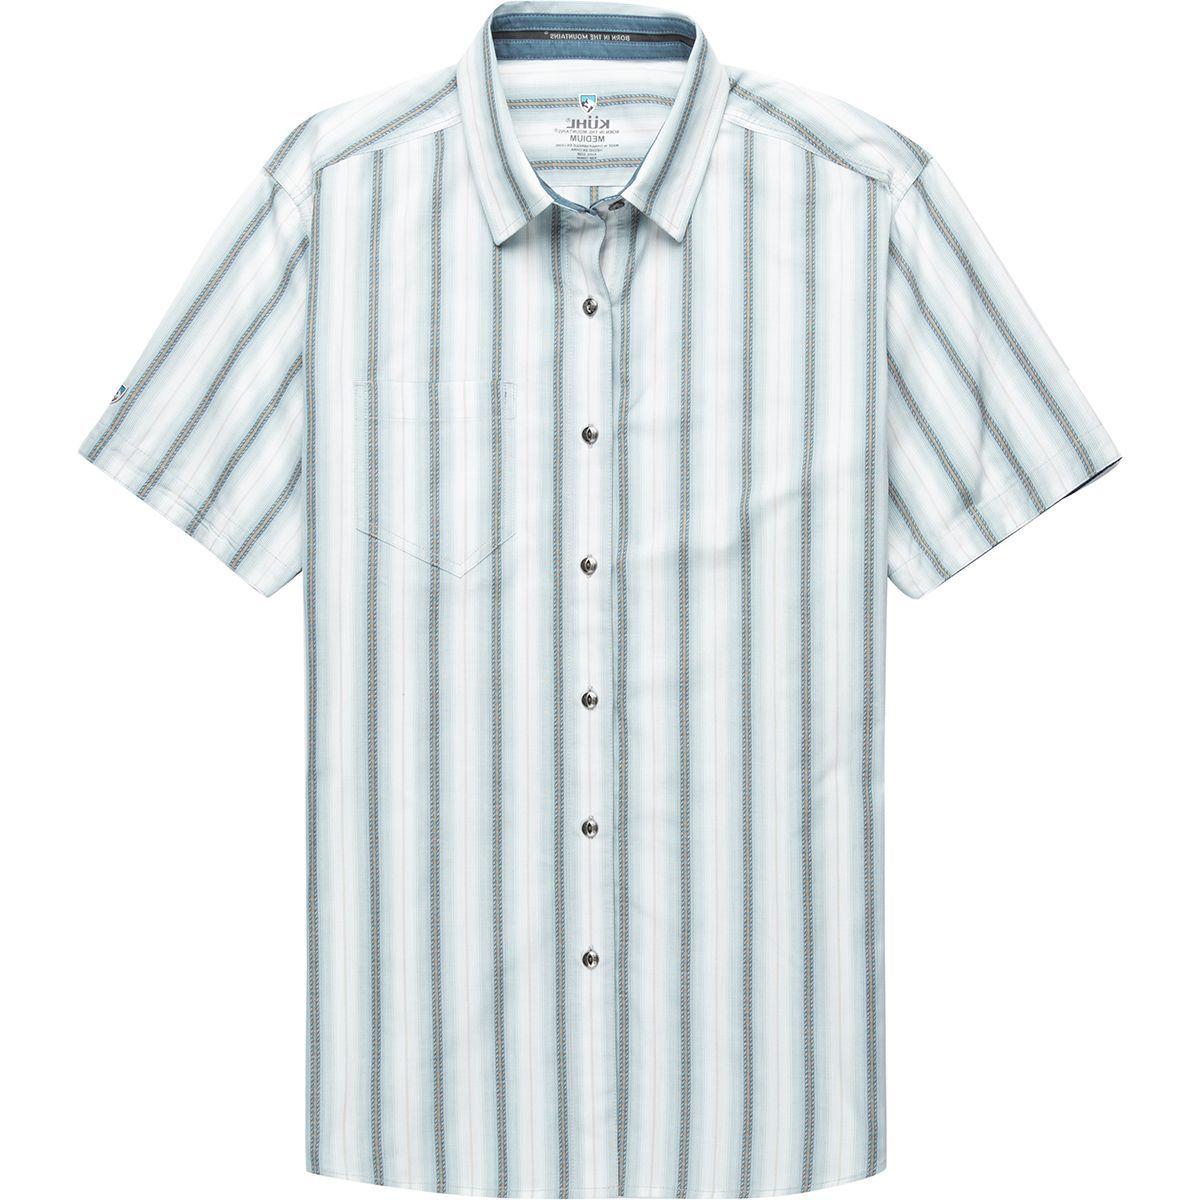 KUHL Bohemian Shirt - Men's